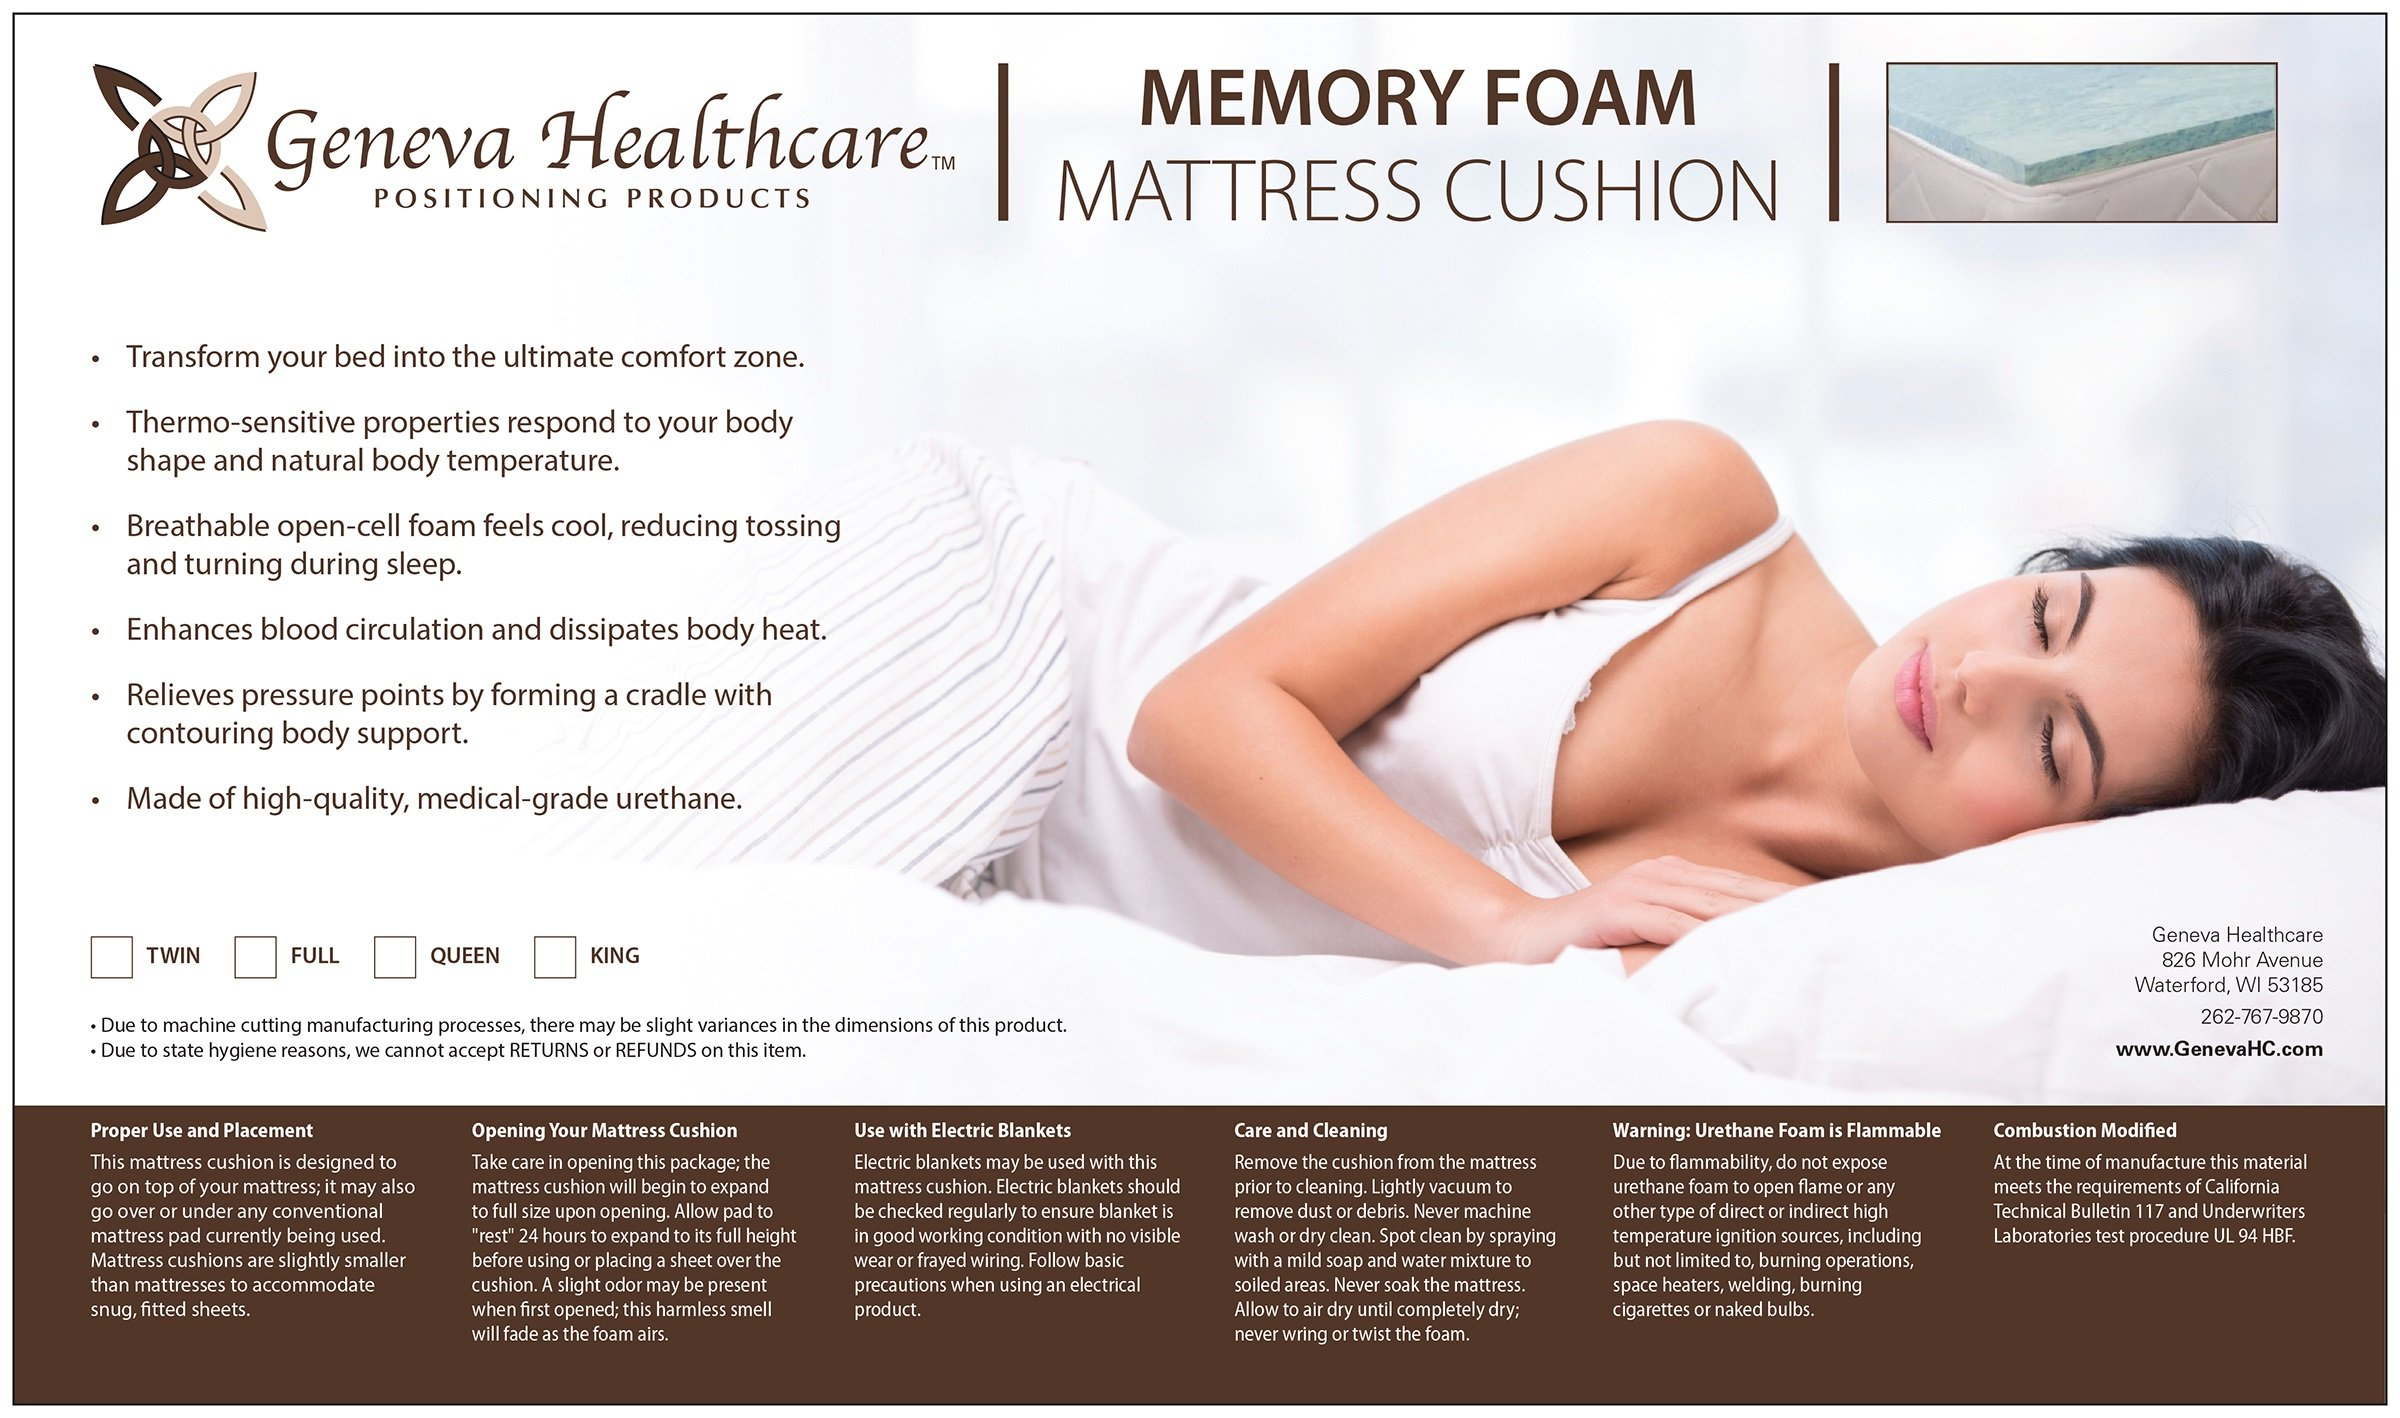 Geneva Healthcare Gel/Visco Memory Foam Mattress Pad 2'' Queen Topper - 2'' x 60'' x 80''